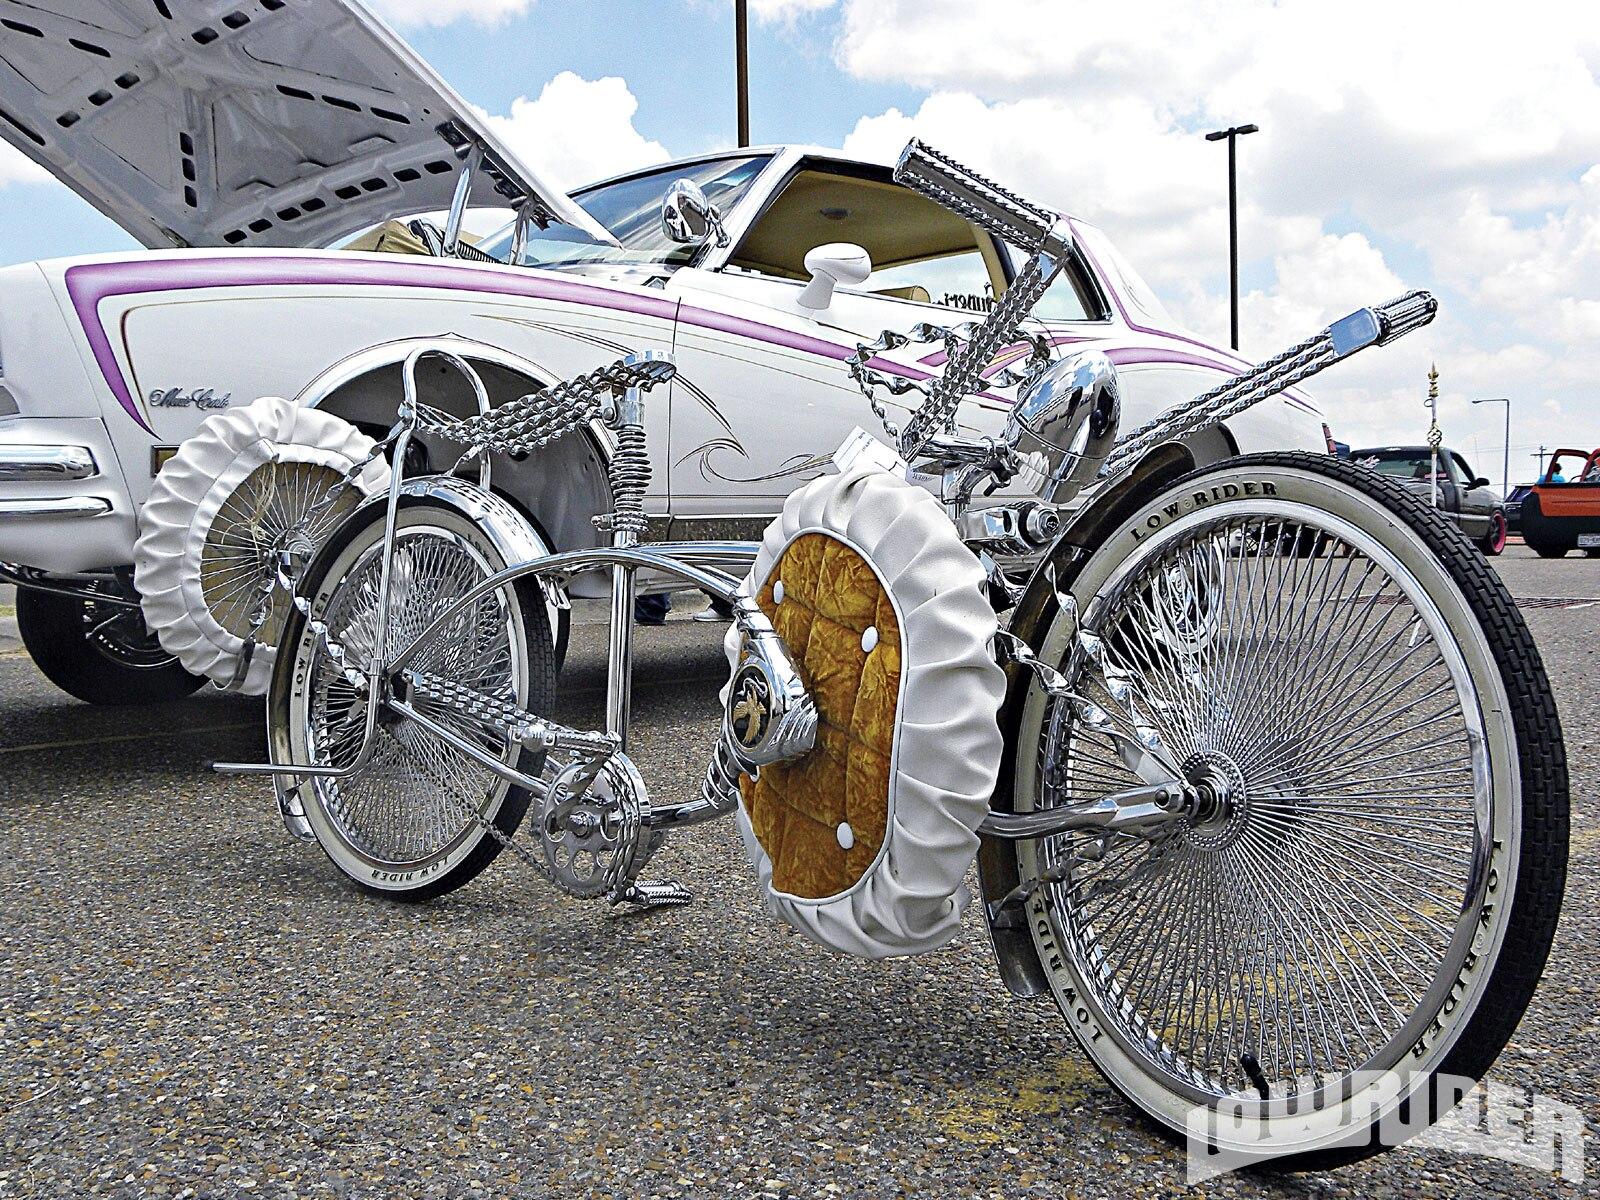 1102_lrmp_21_o-ranfla_show_chicago-custom_bicycle1